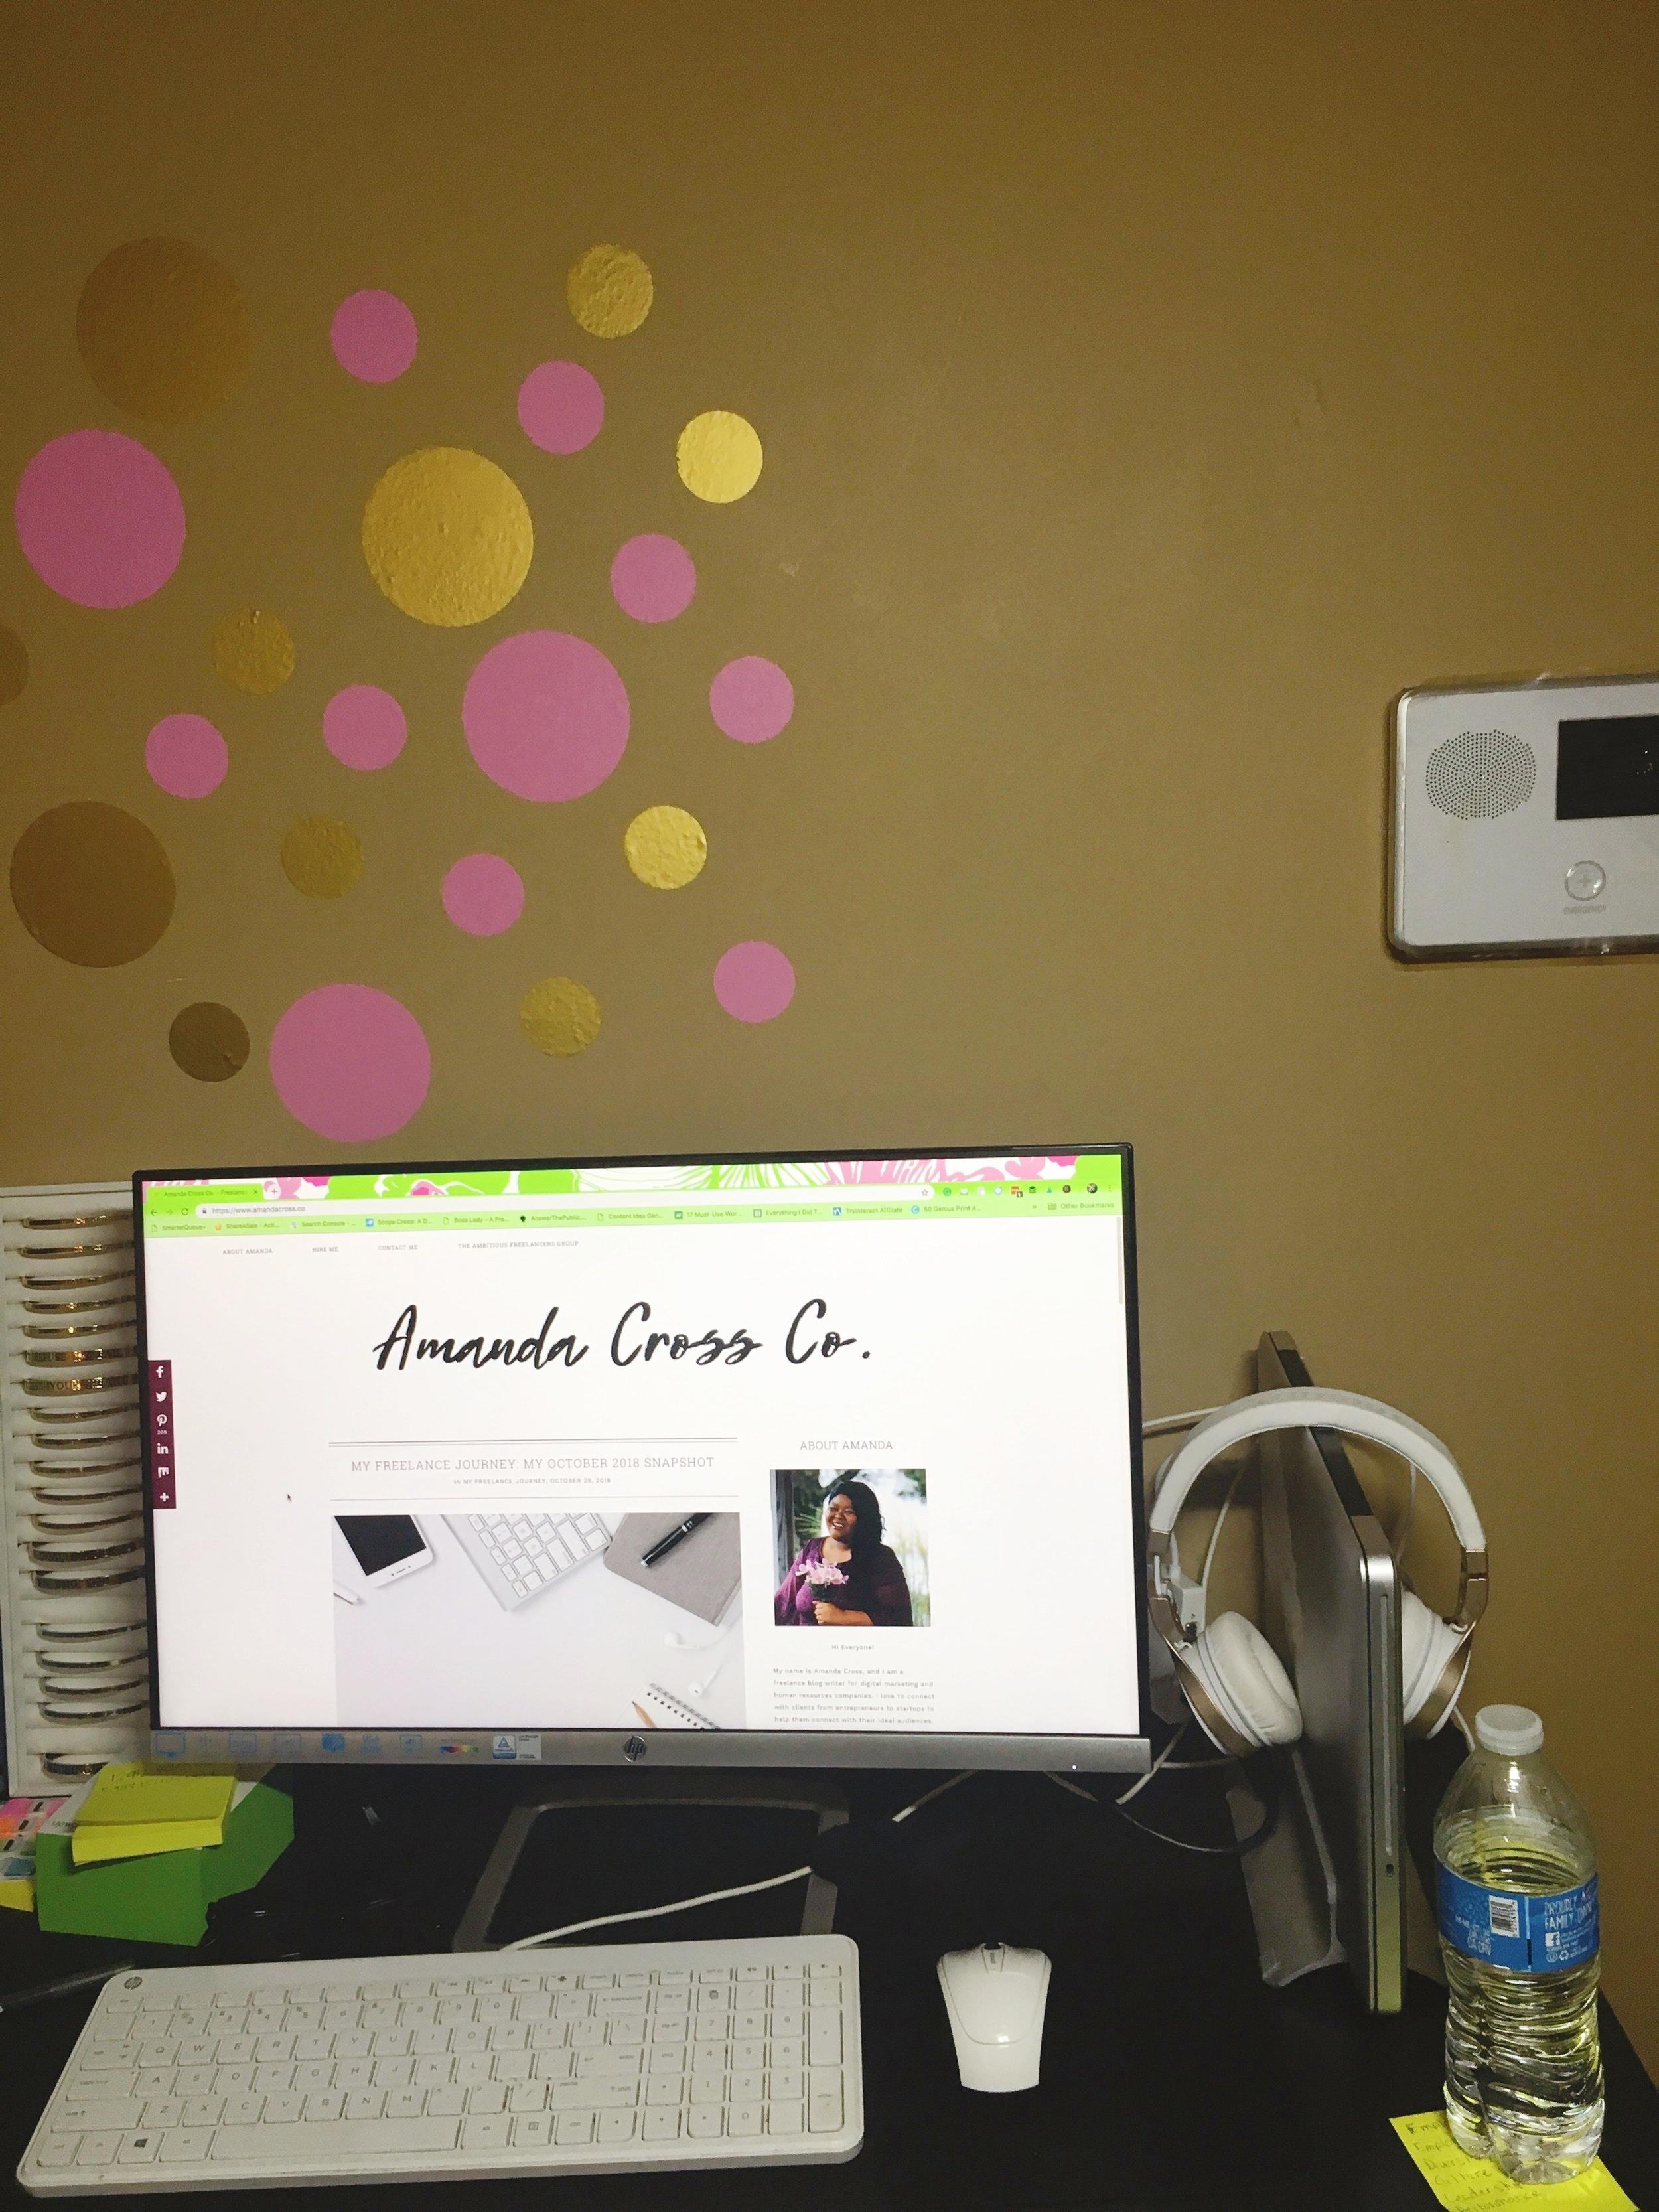 Amanda Cross Co's desk setup with macbook pro and external monitor.